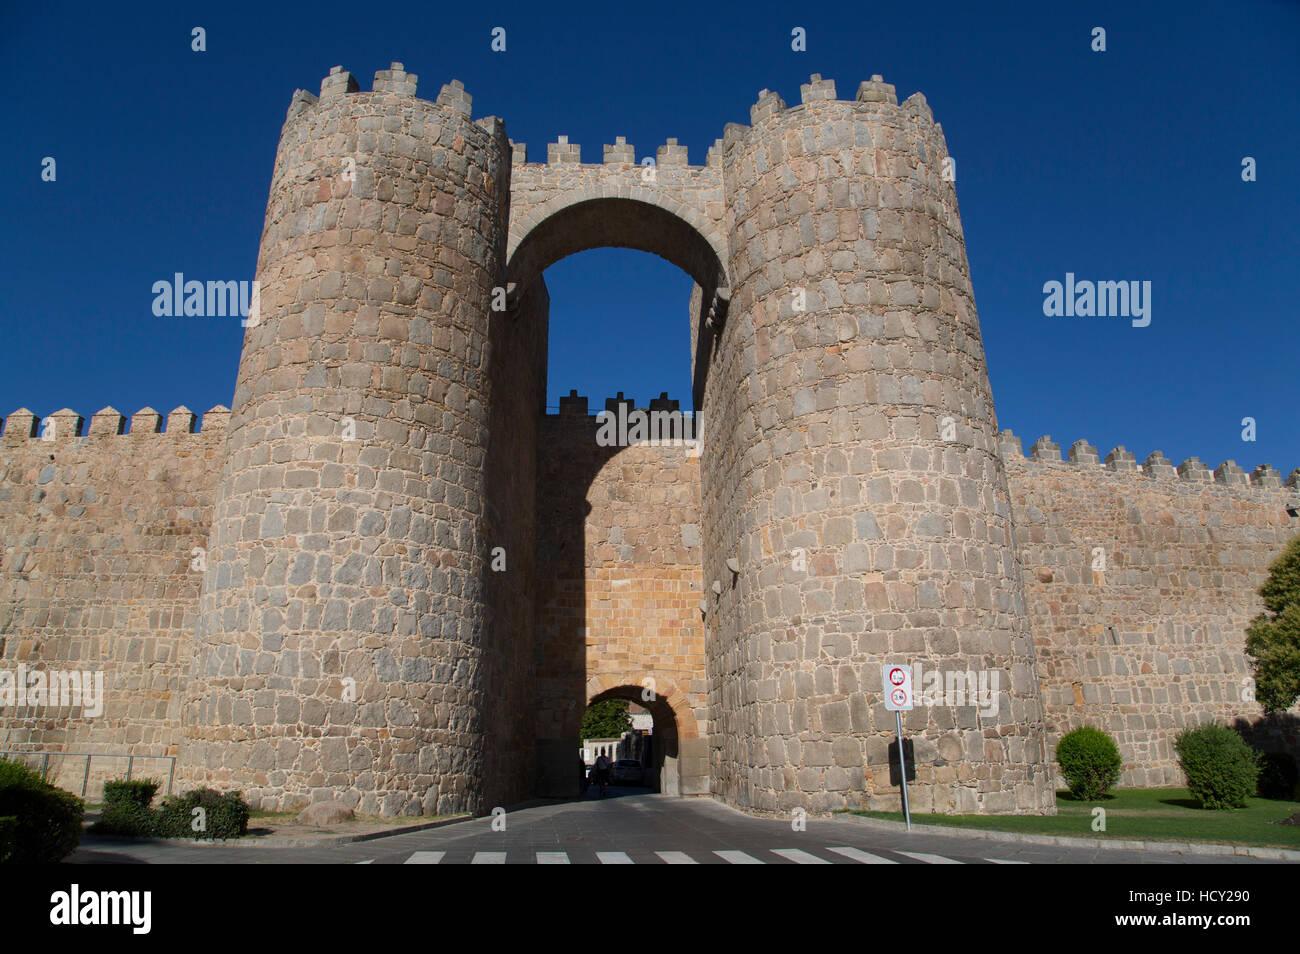 Puerta de Mariscal, Avila, UNESCO, Castile and Leon, Spain - Stock Image